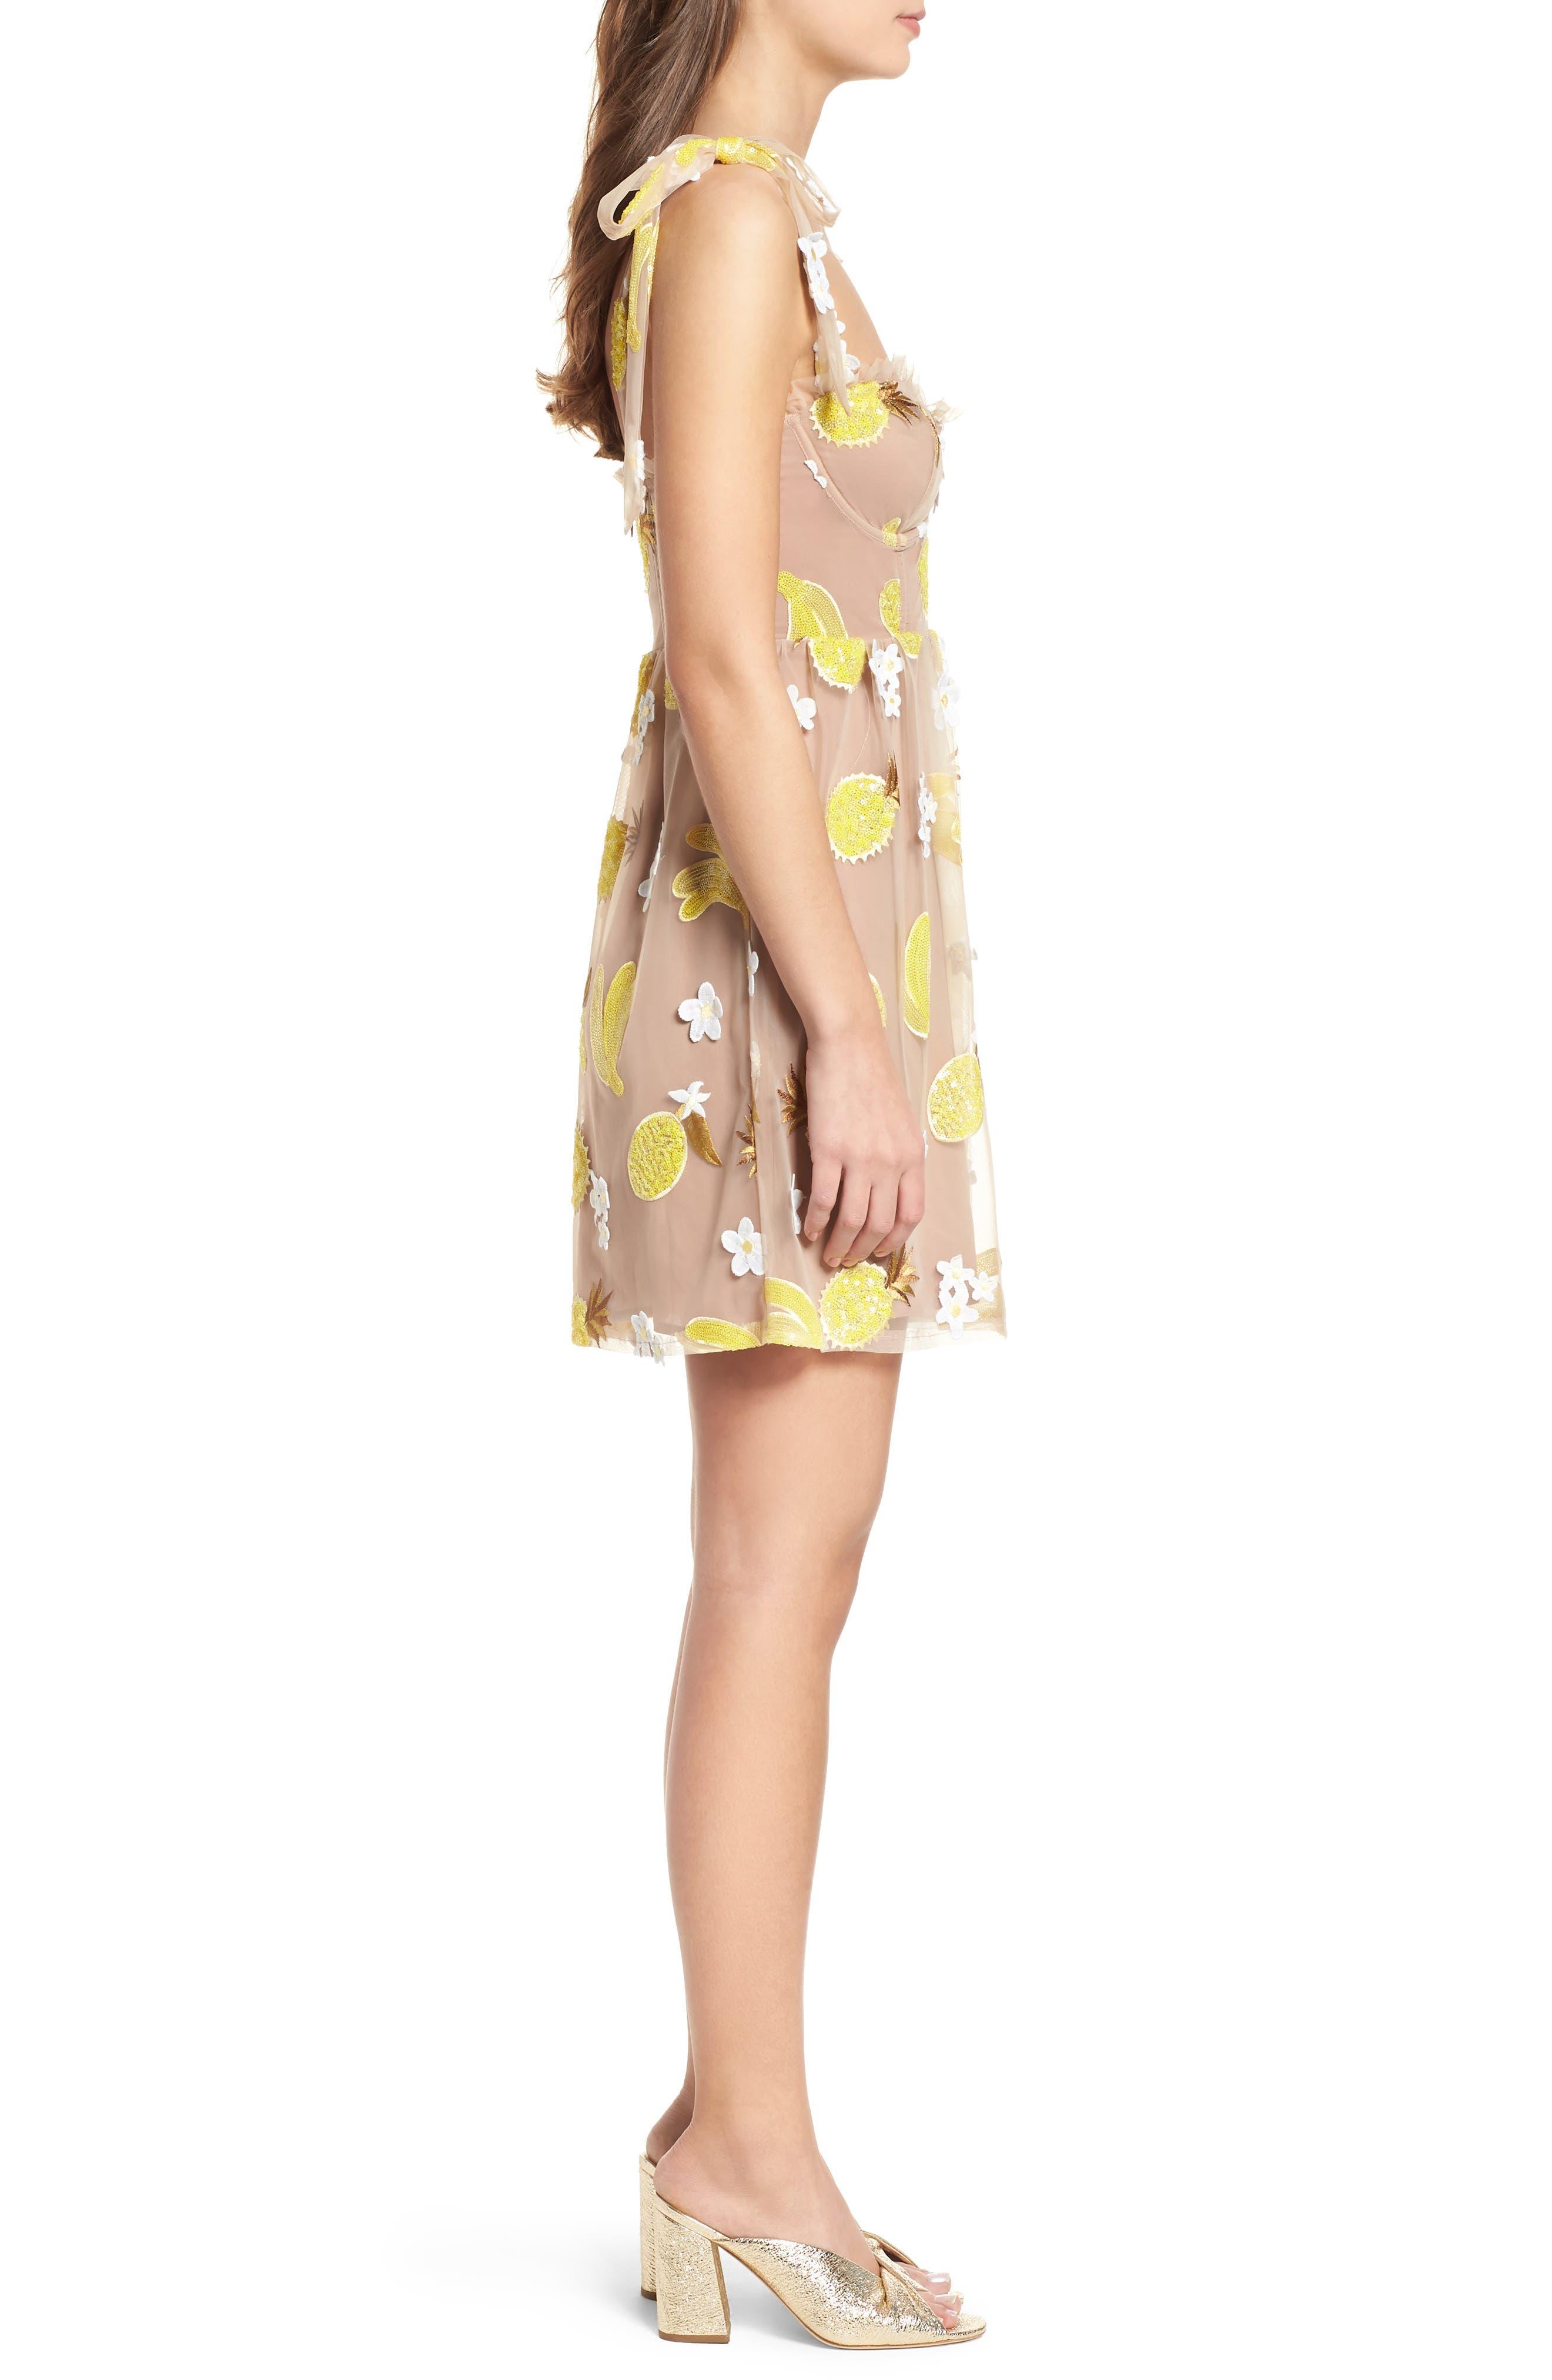 Fruitpunch Sequin Minidress,                             Alternate thumbnail 3, color,                             250